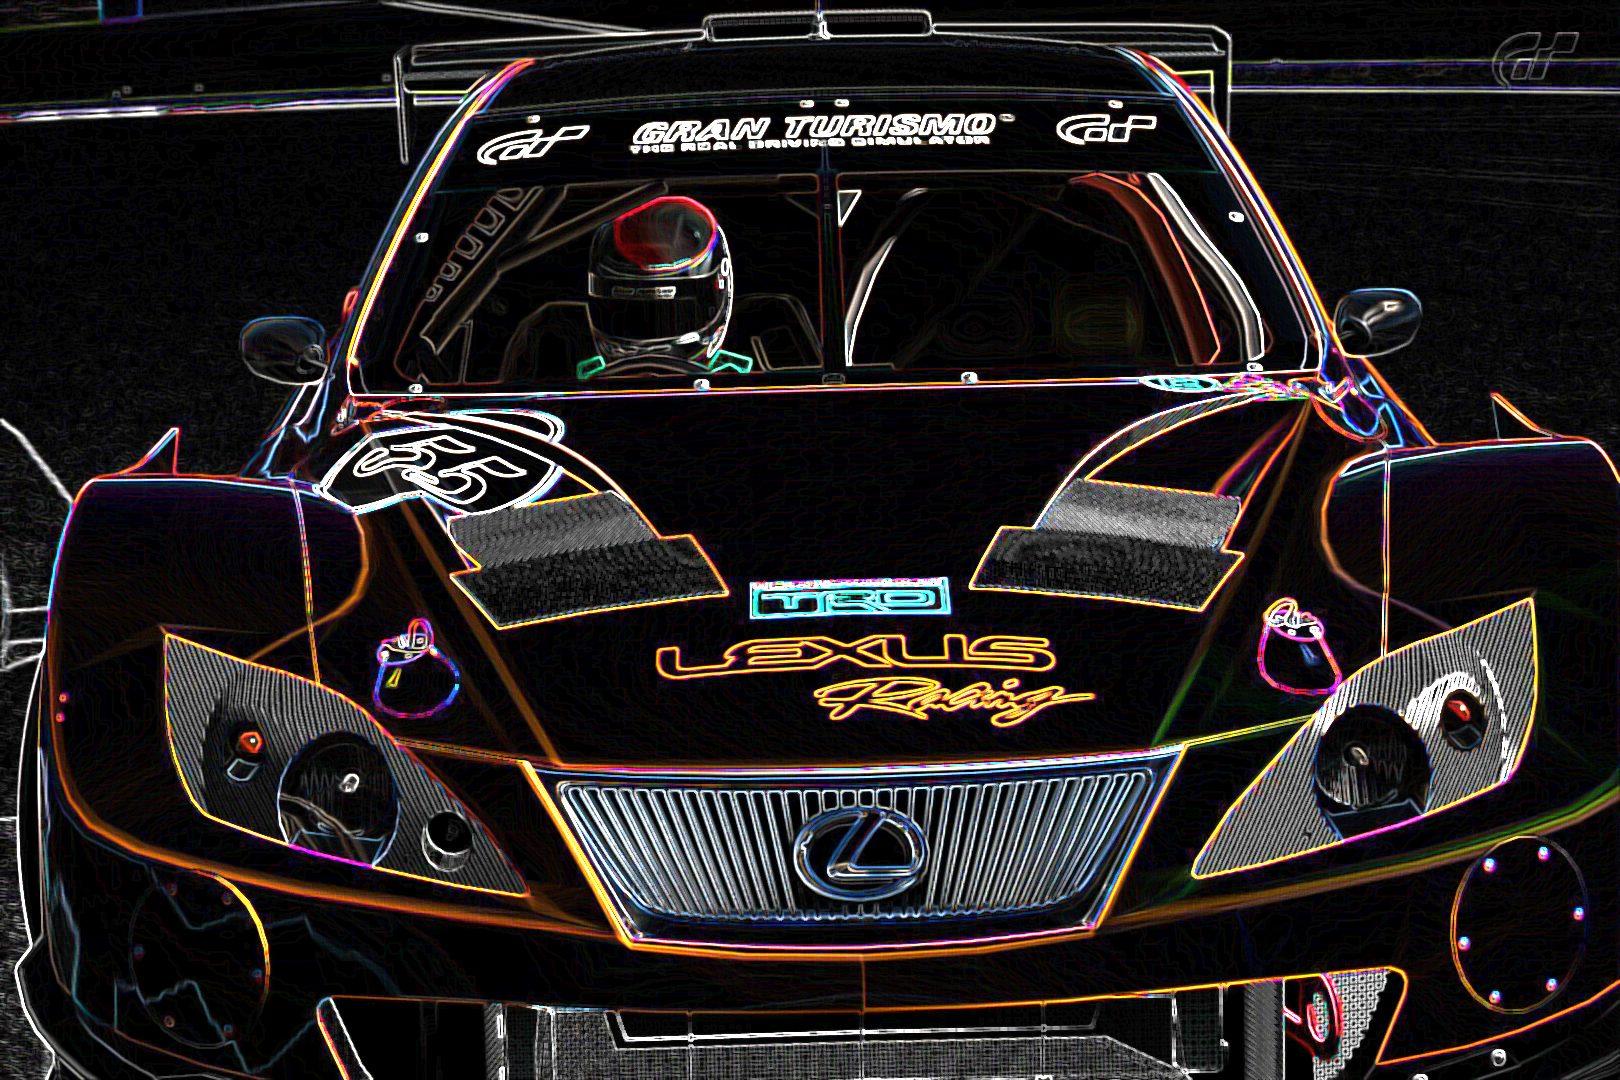 Fuji Speedway GT_17adj.jpg